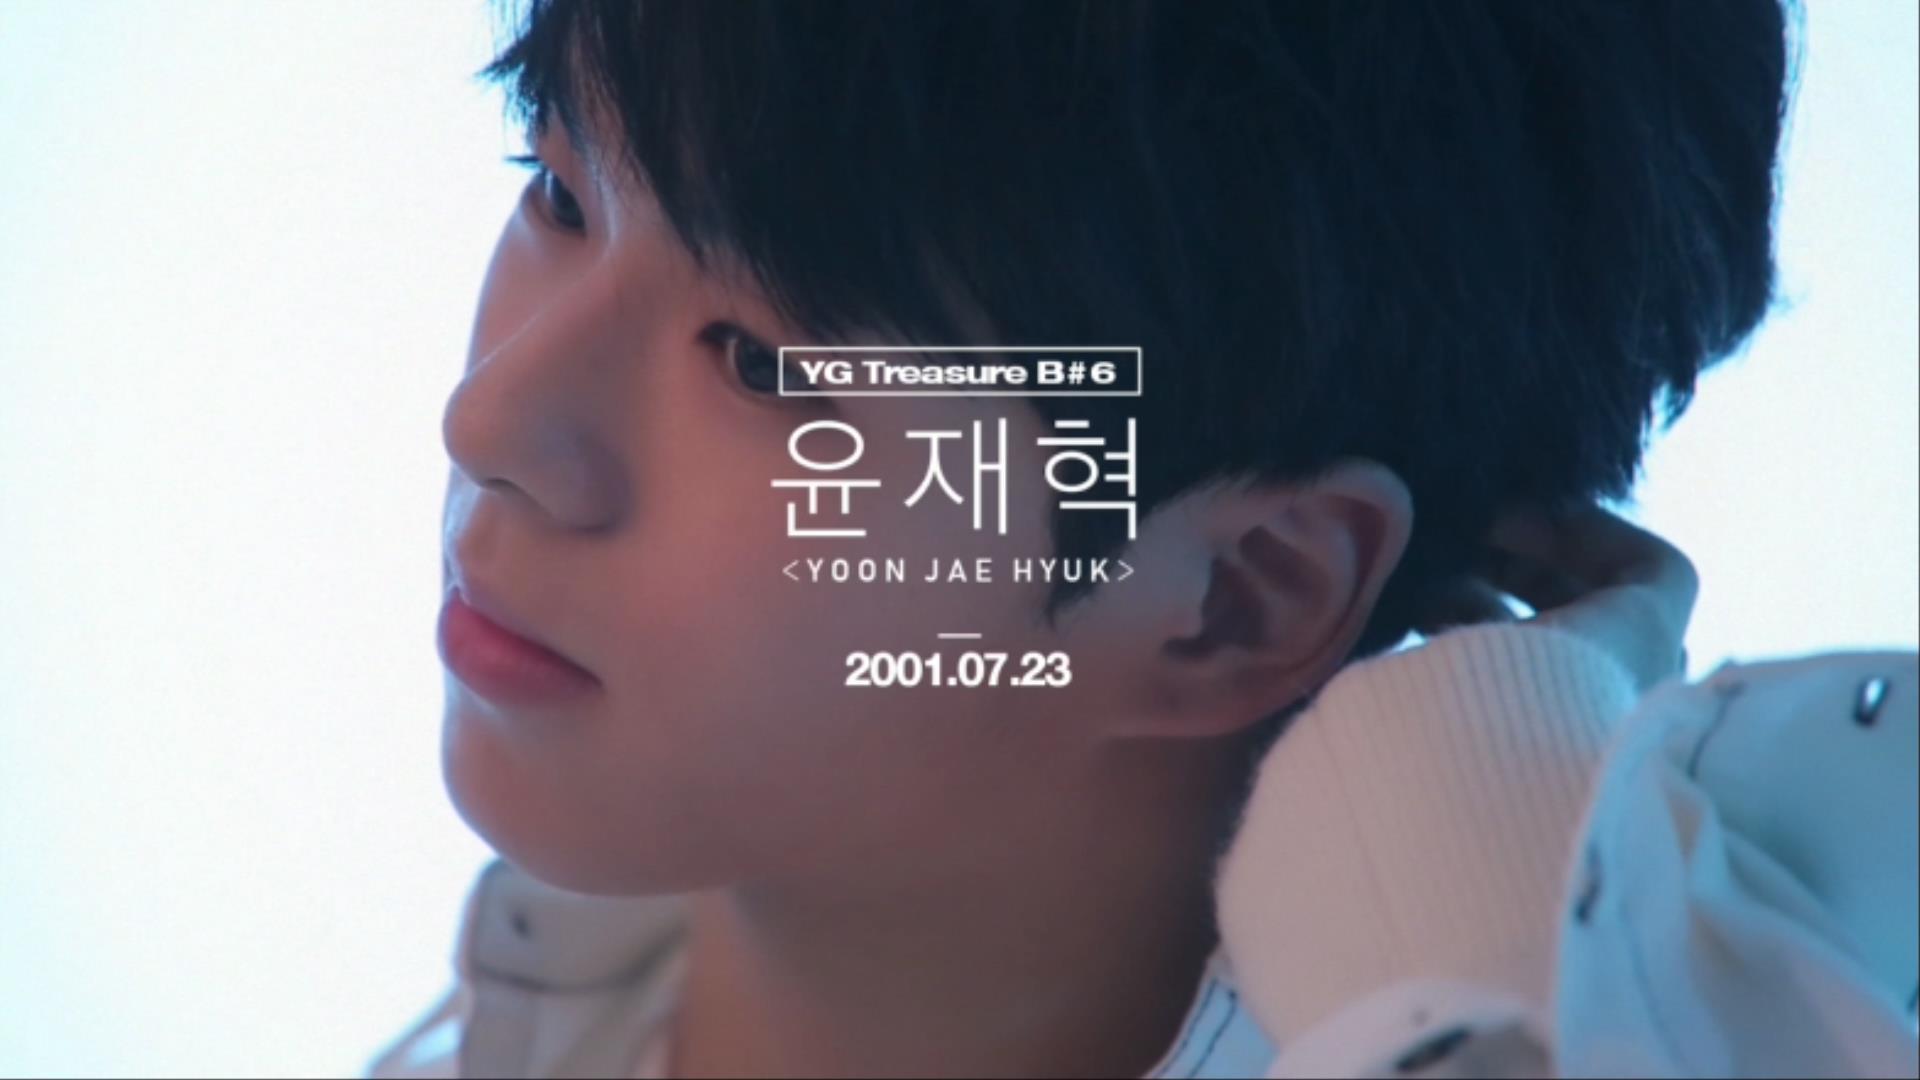 YG보석함ㅣB#6 윤재혁 <YOON JAEHYUK> PROFILE MAKING FILM